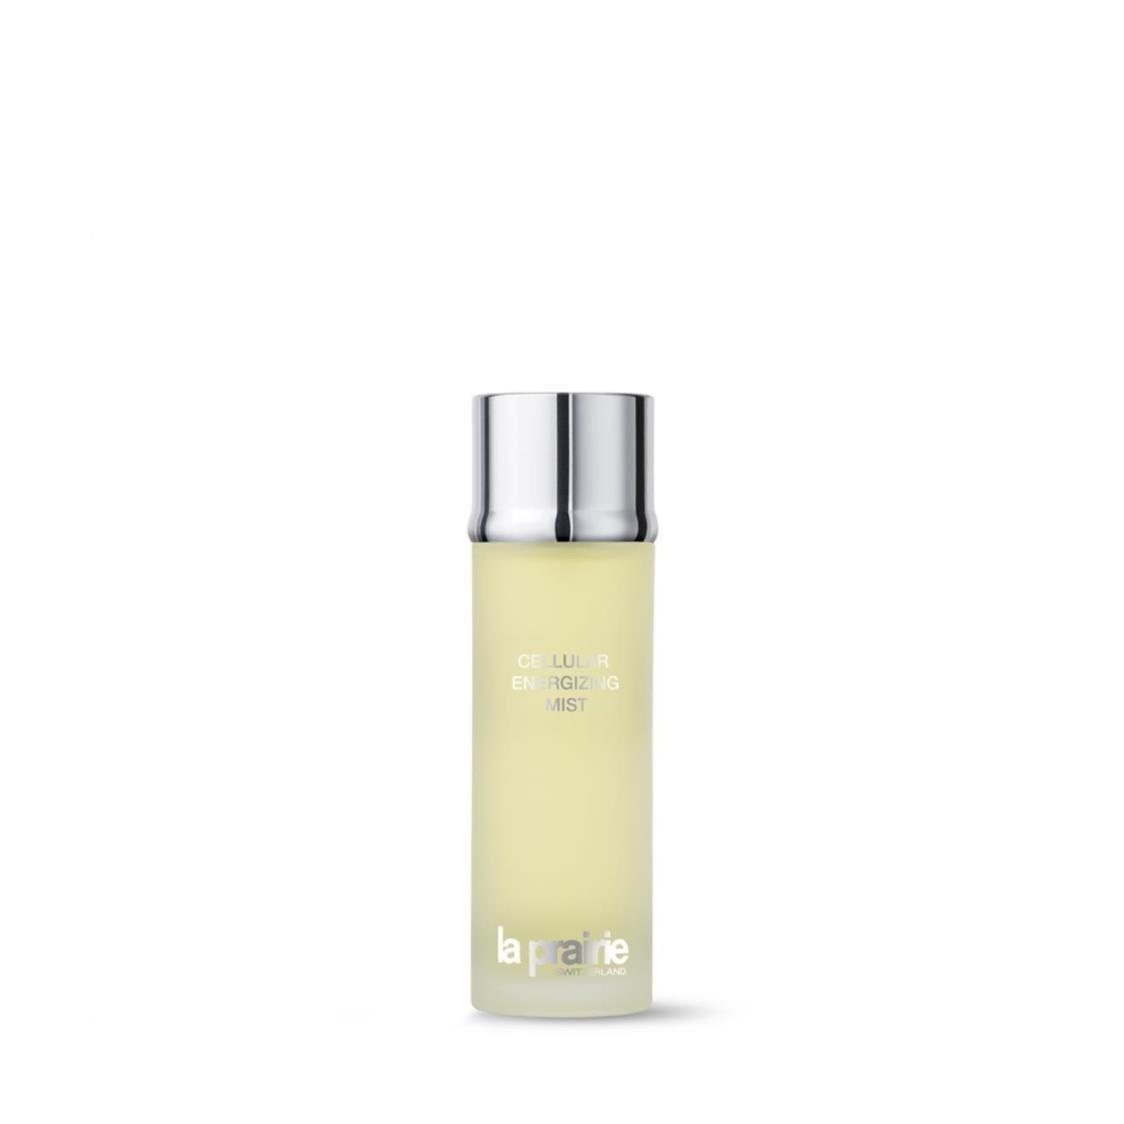 Cellular Energizing Body Spray 100ml